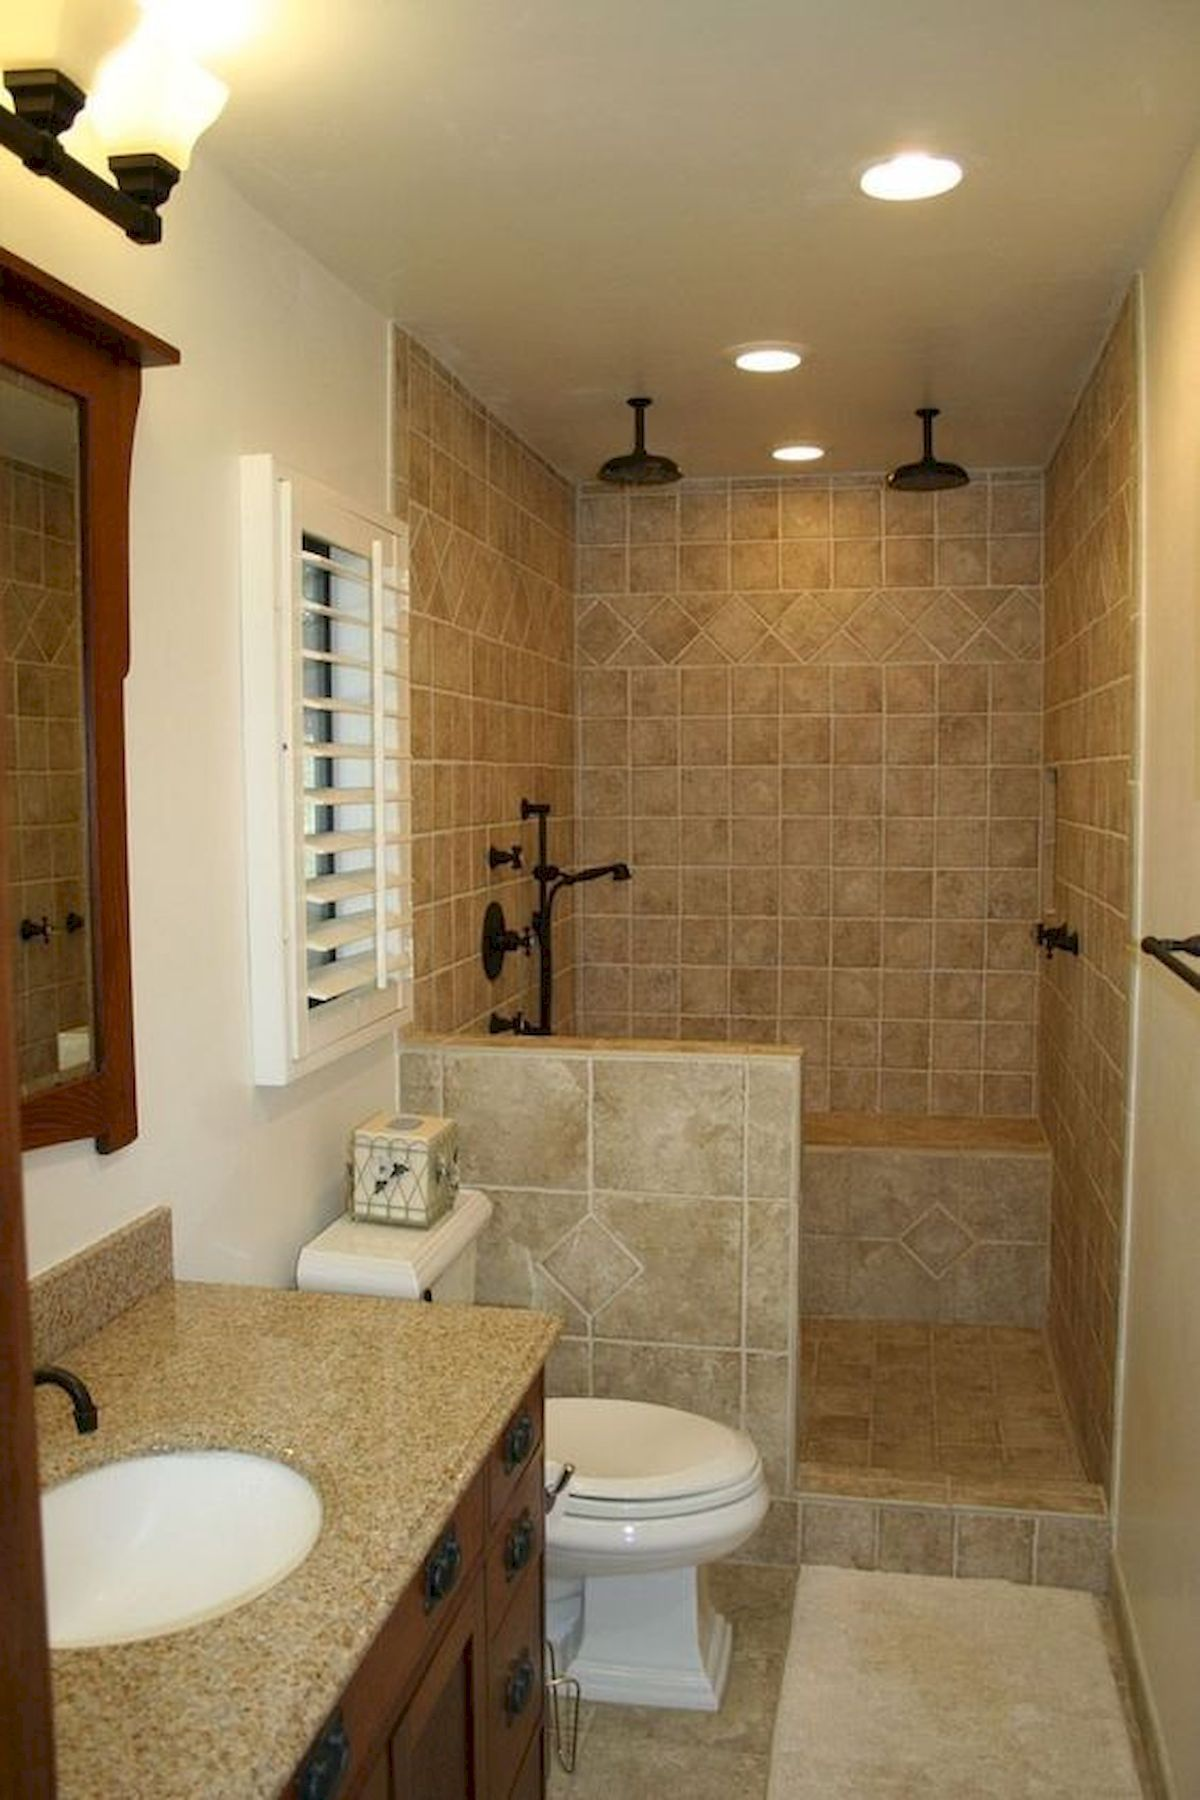 60 elegant small master bathroom remodel ideas 32 small on bathroom renovation ideas for small bathrooms id=74885